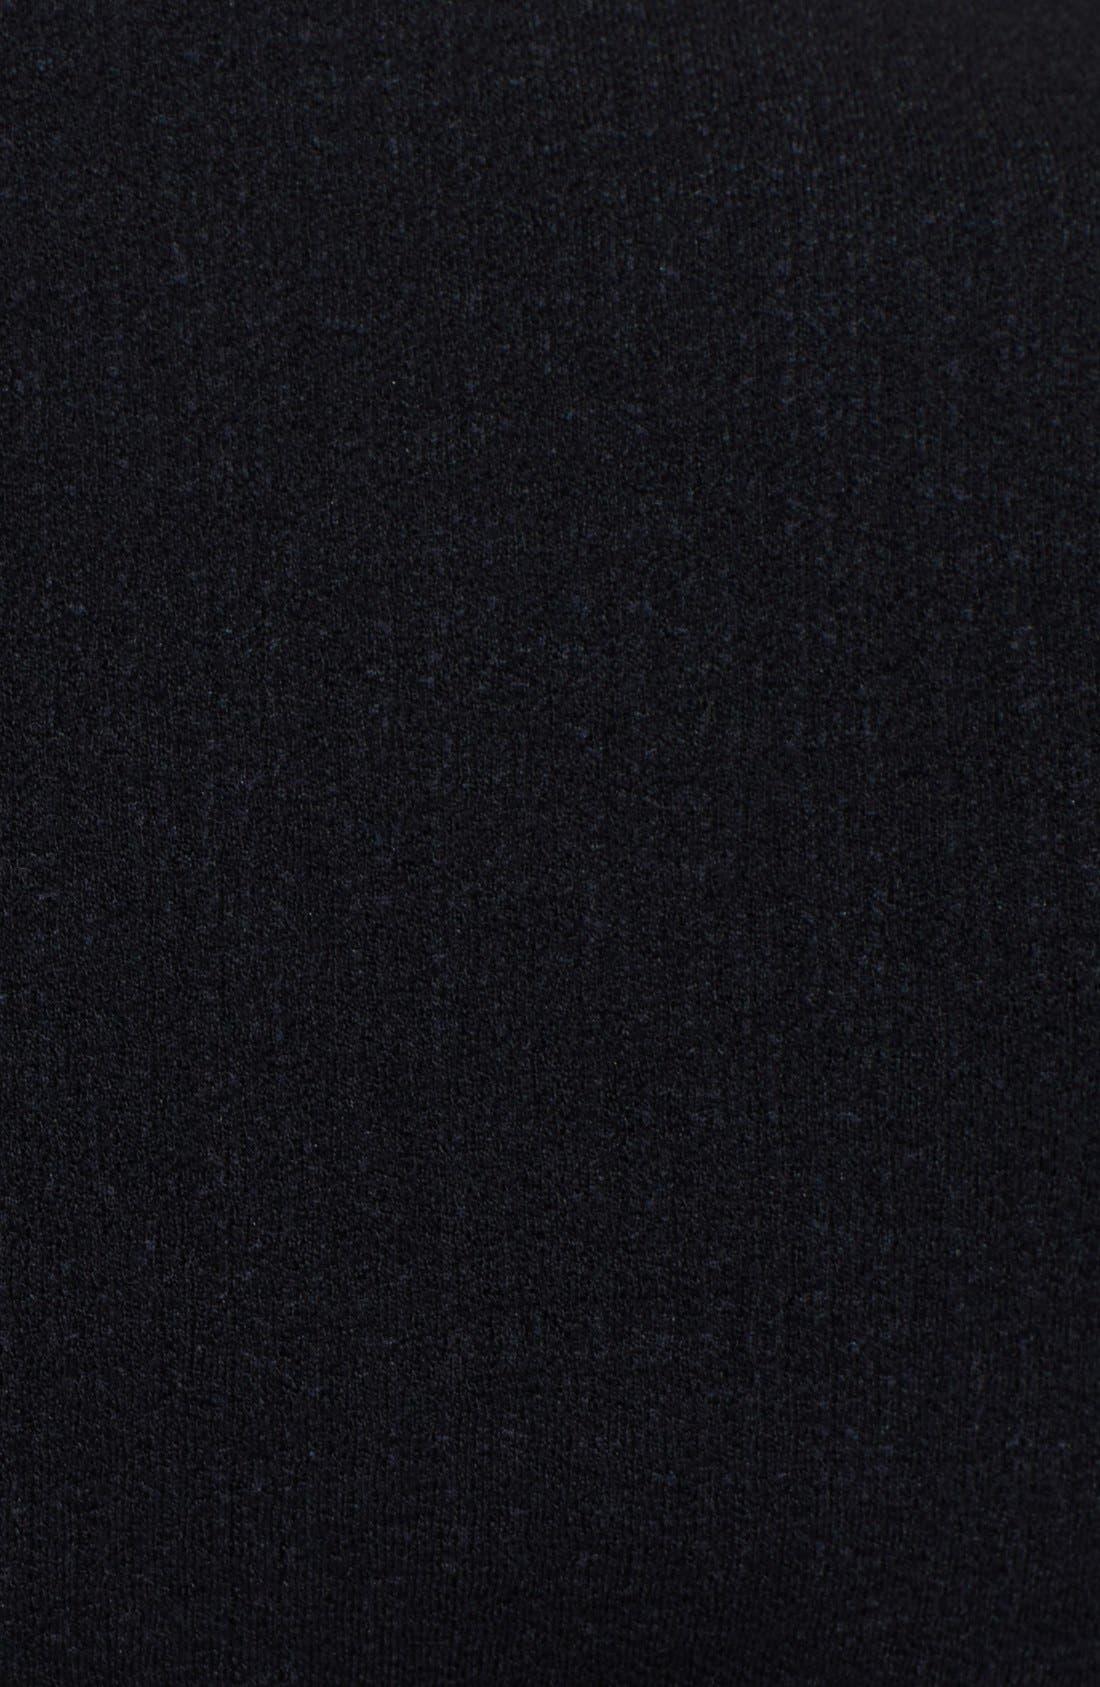 Alternate Image 3  - Proenza Schouler Short Sleeve Jersey Dress